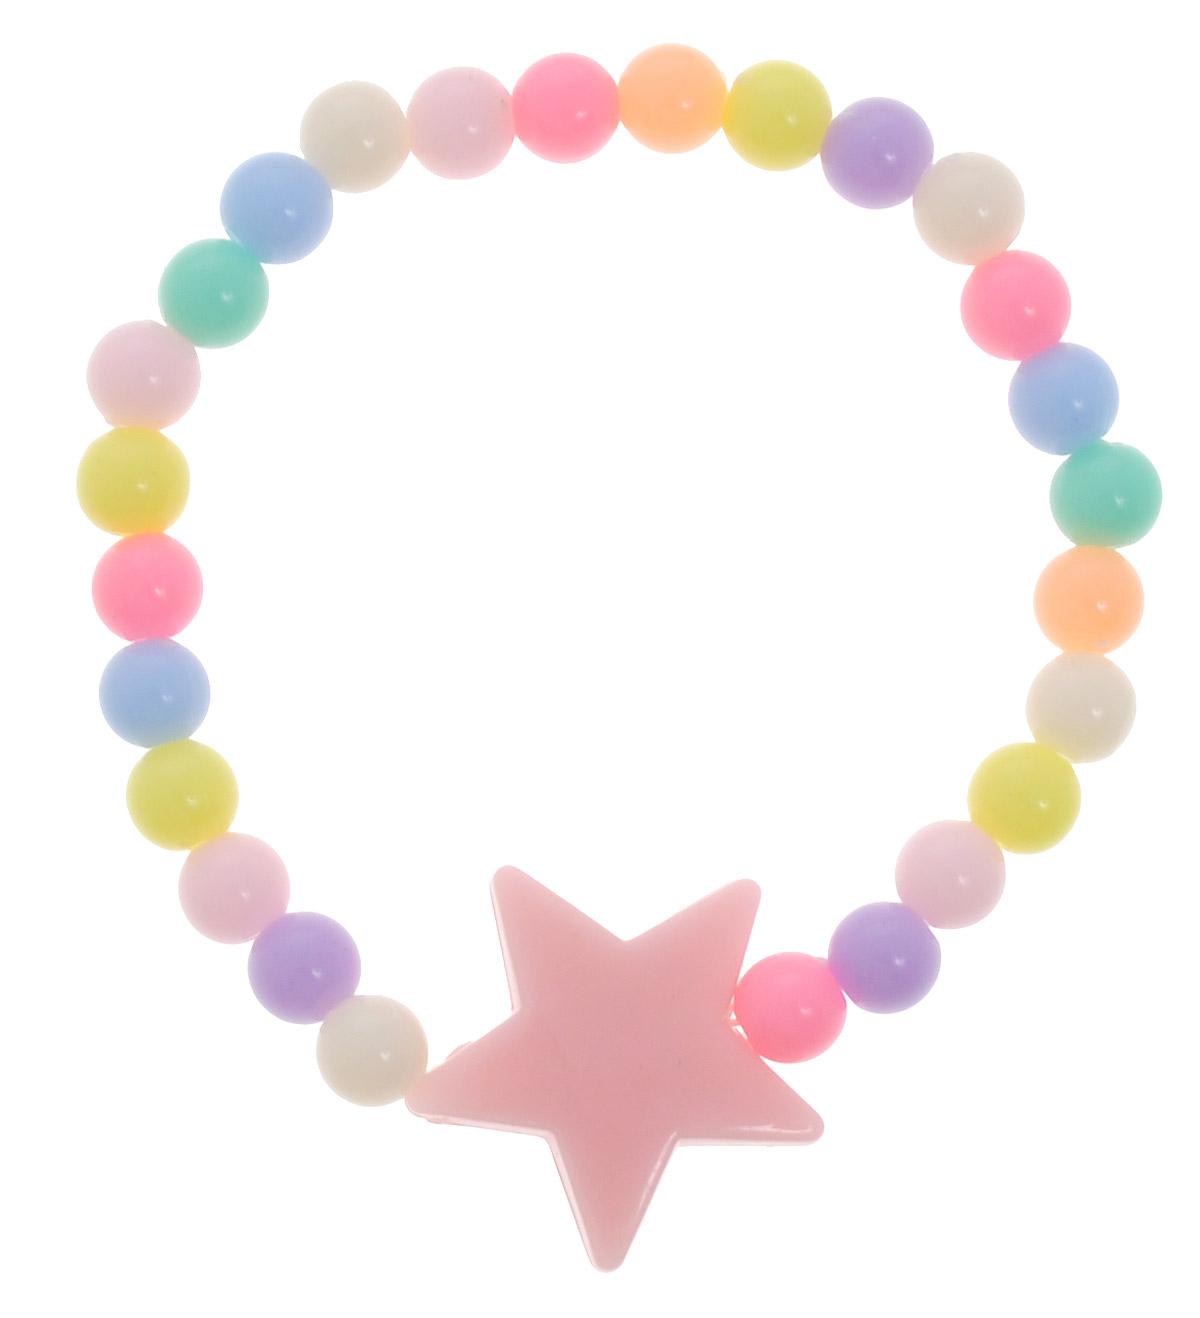 Baby\'s Joy Резинка для волос Звездочка цвет светло-розовый ( VT 303_Звездочка-светло-розовый )